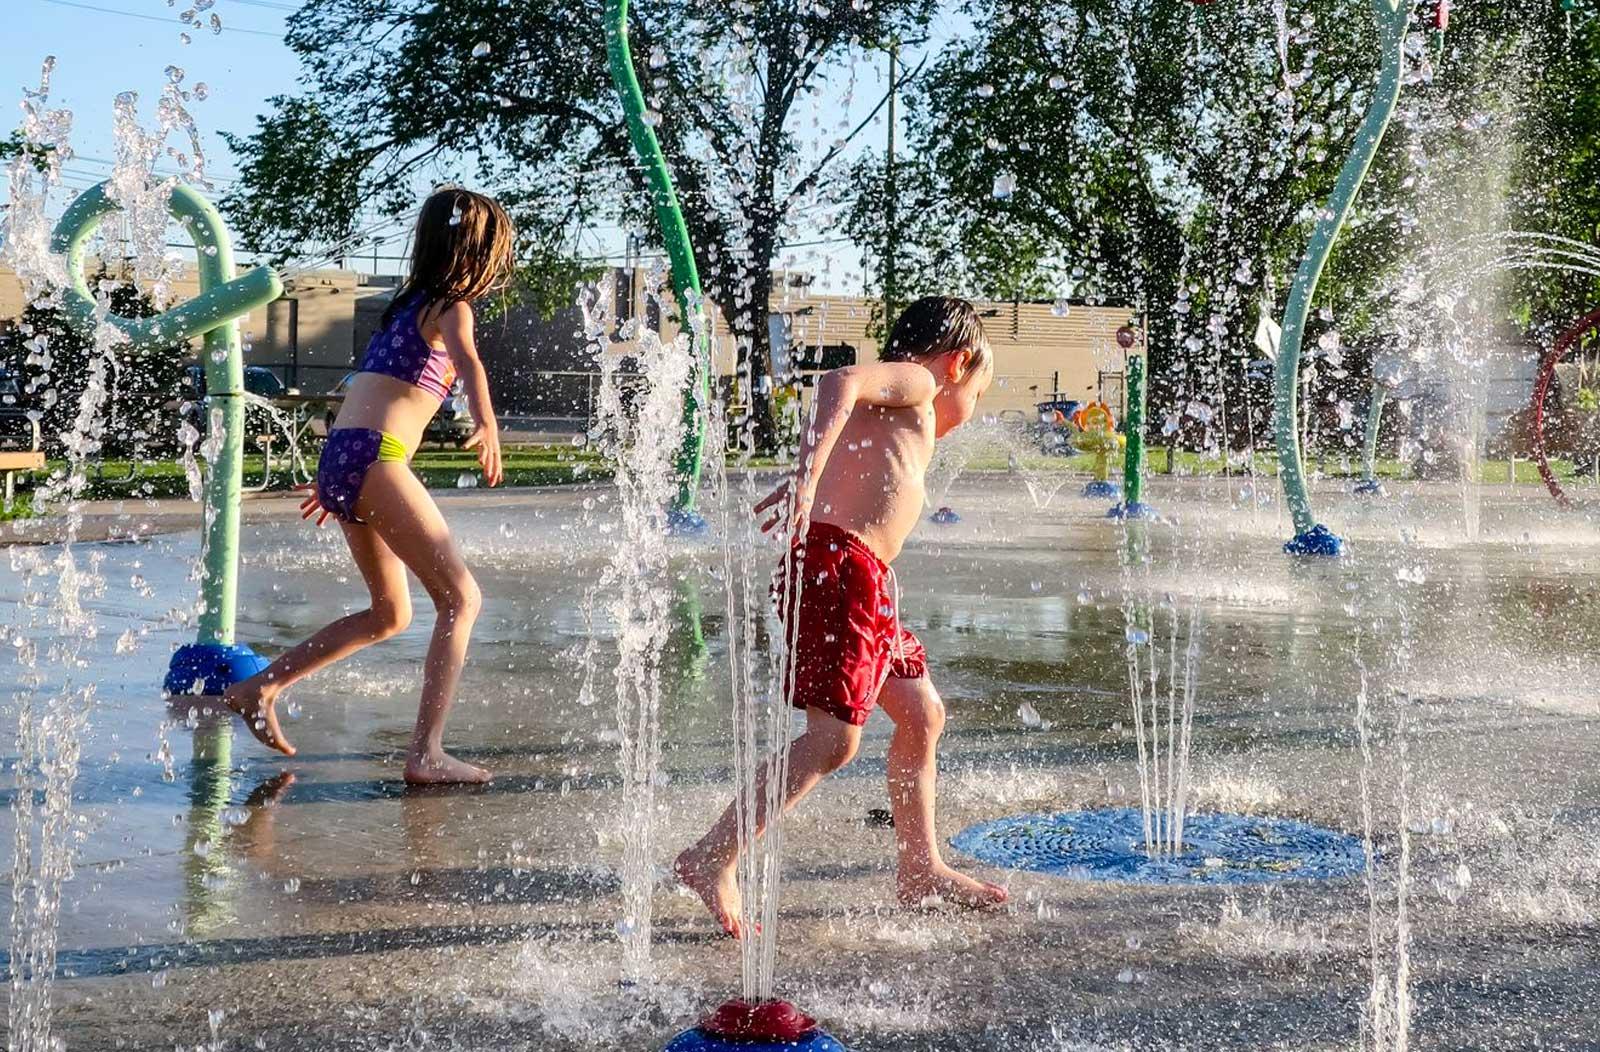 children running though water park